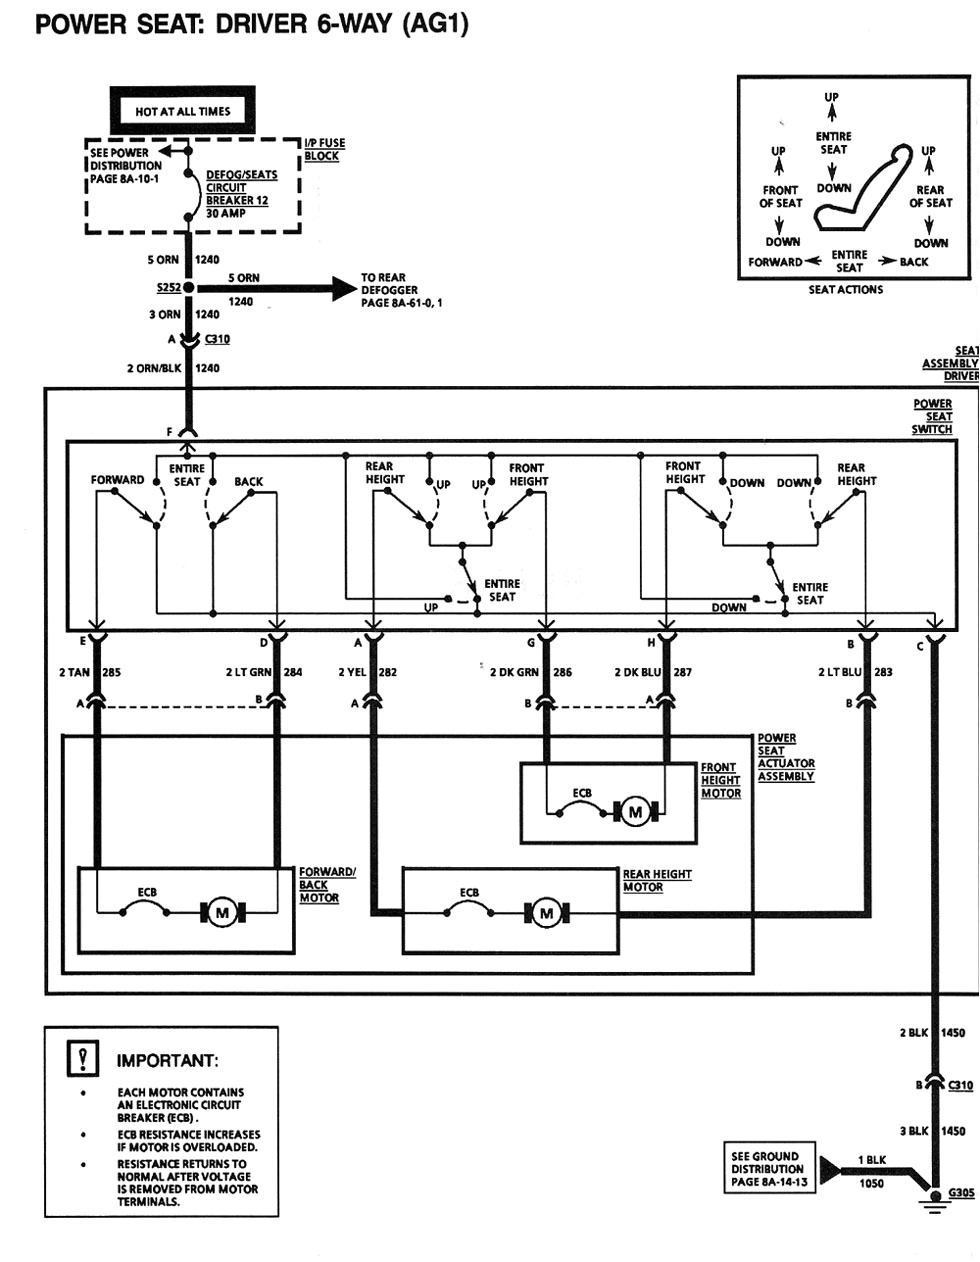 4th gen lt1 f body tech aids 1996 camaro wiring diagram 1996 camaro wiring diagram